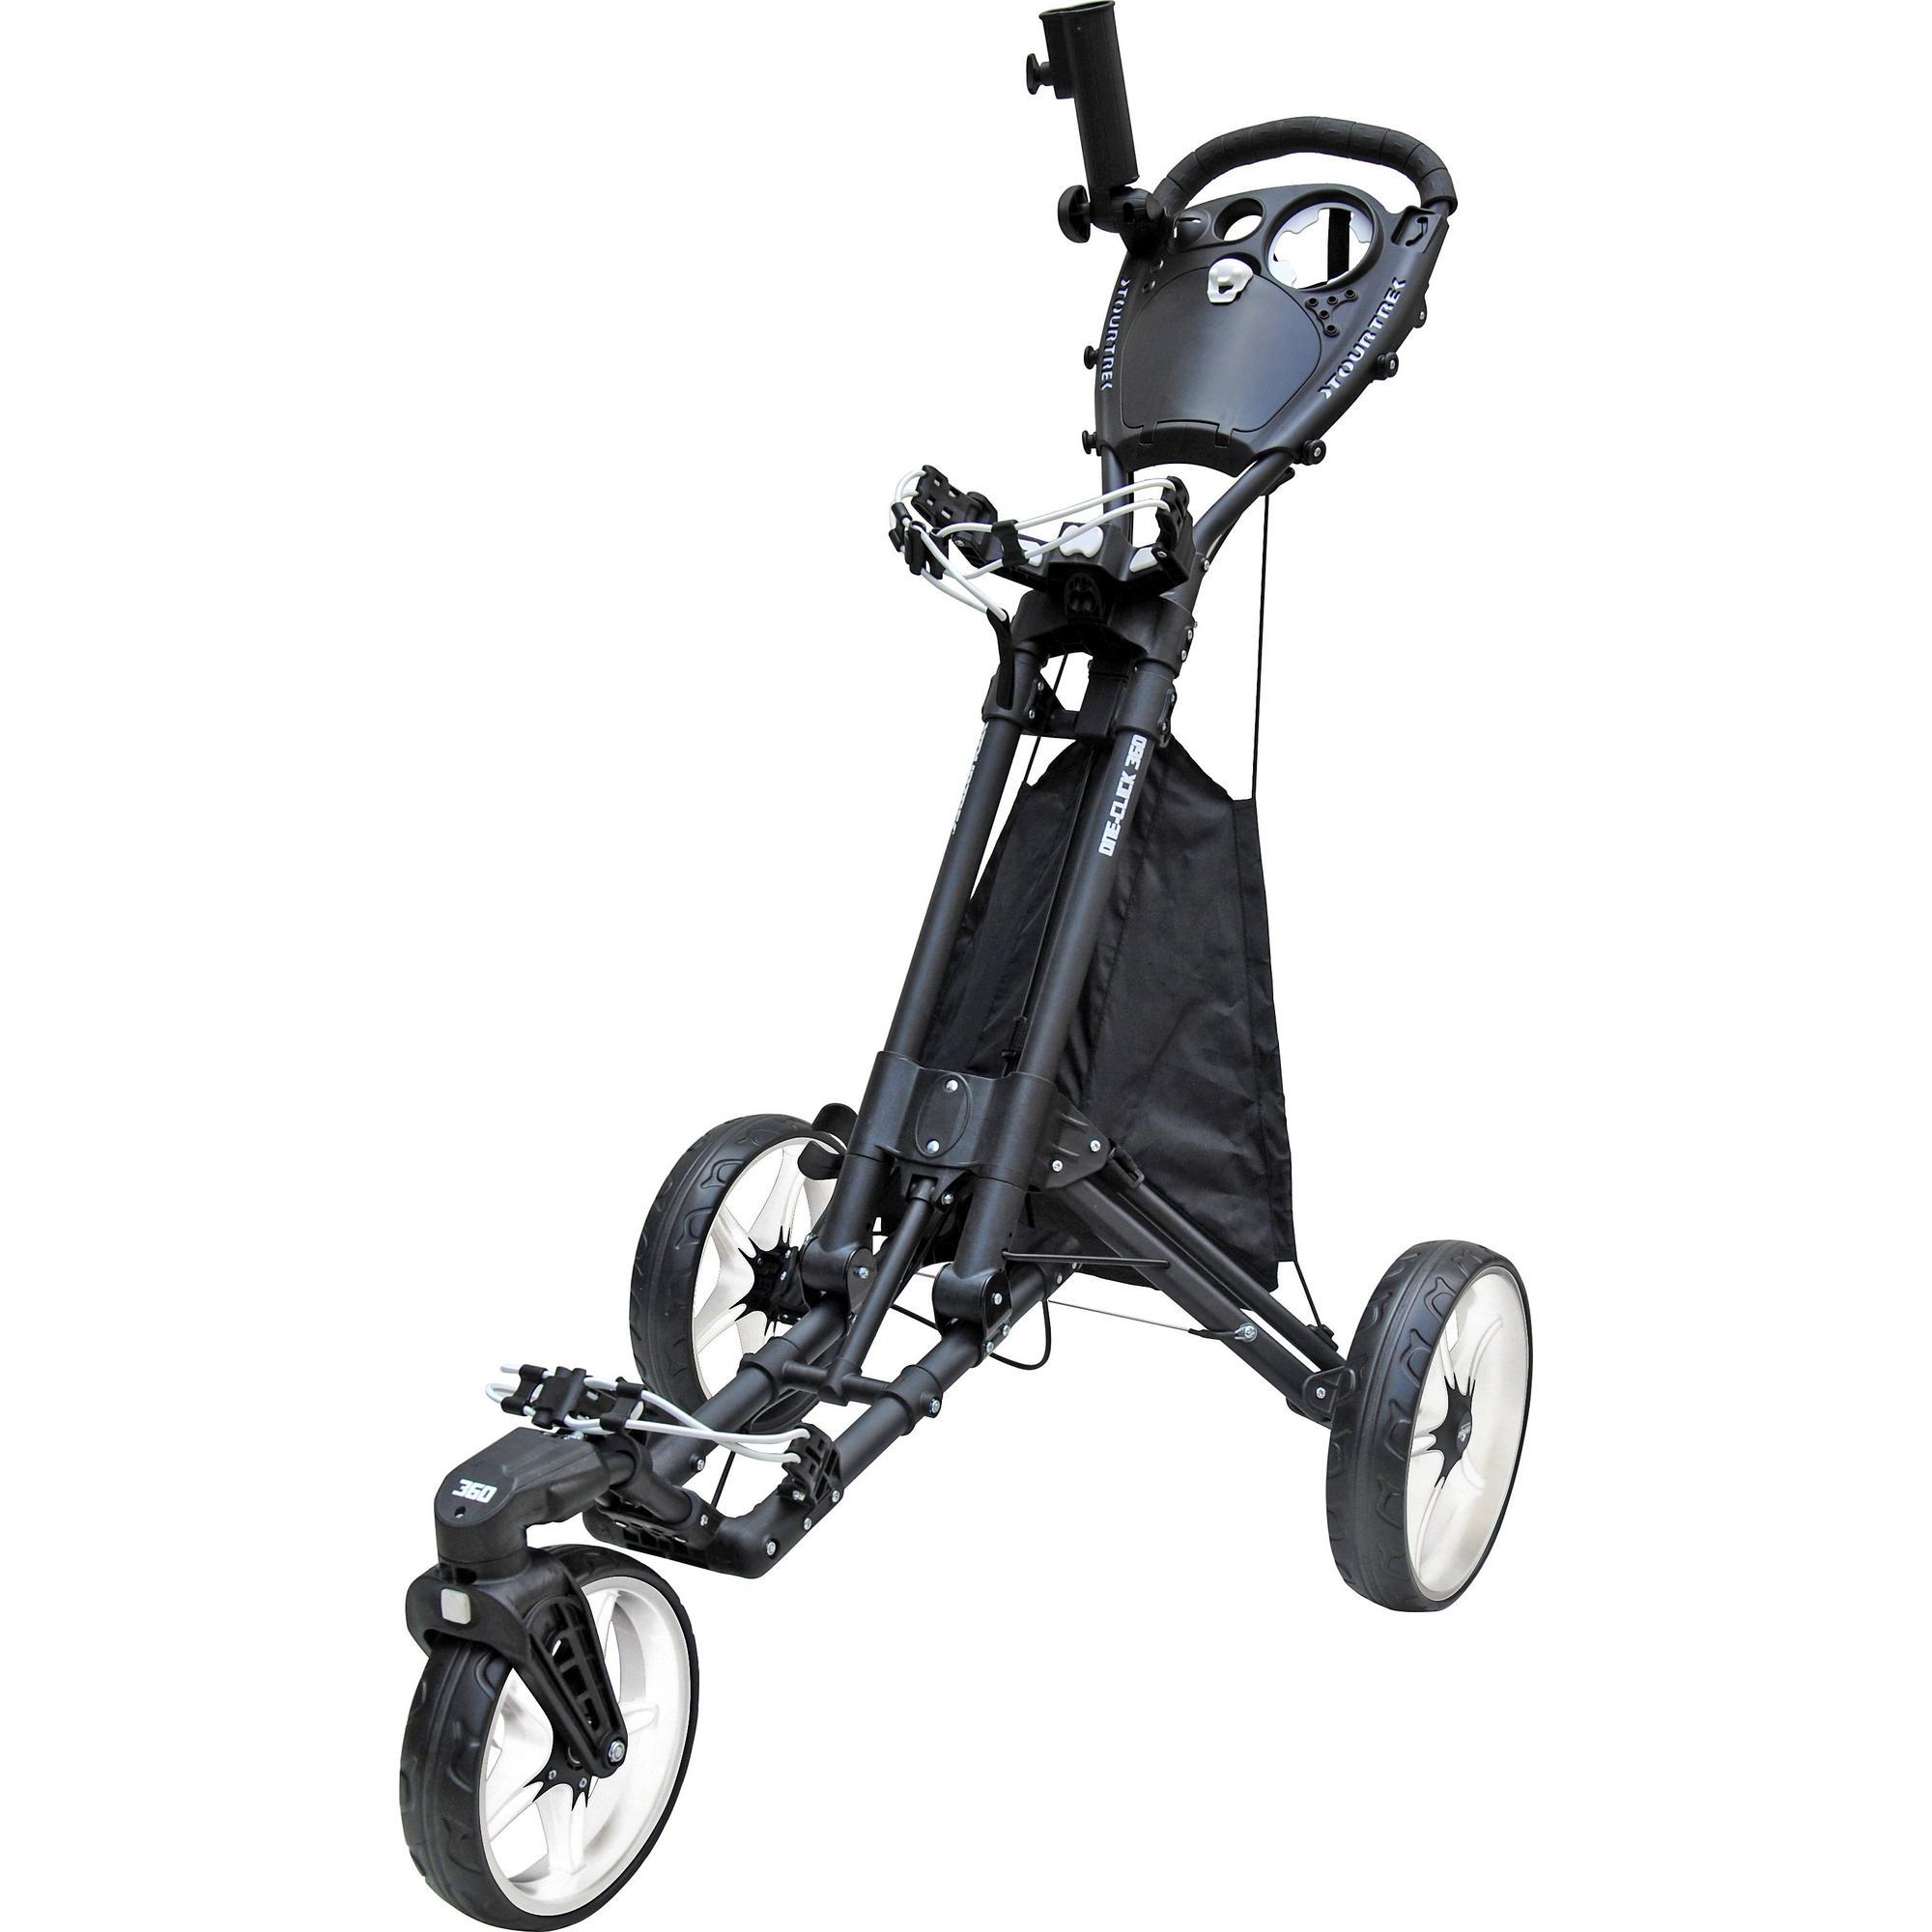 One-Click 360 Push Cart